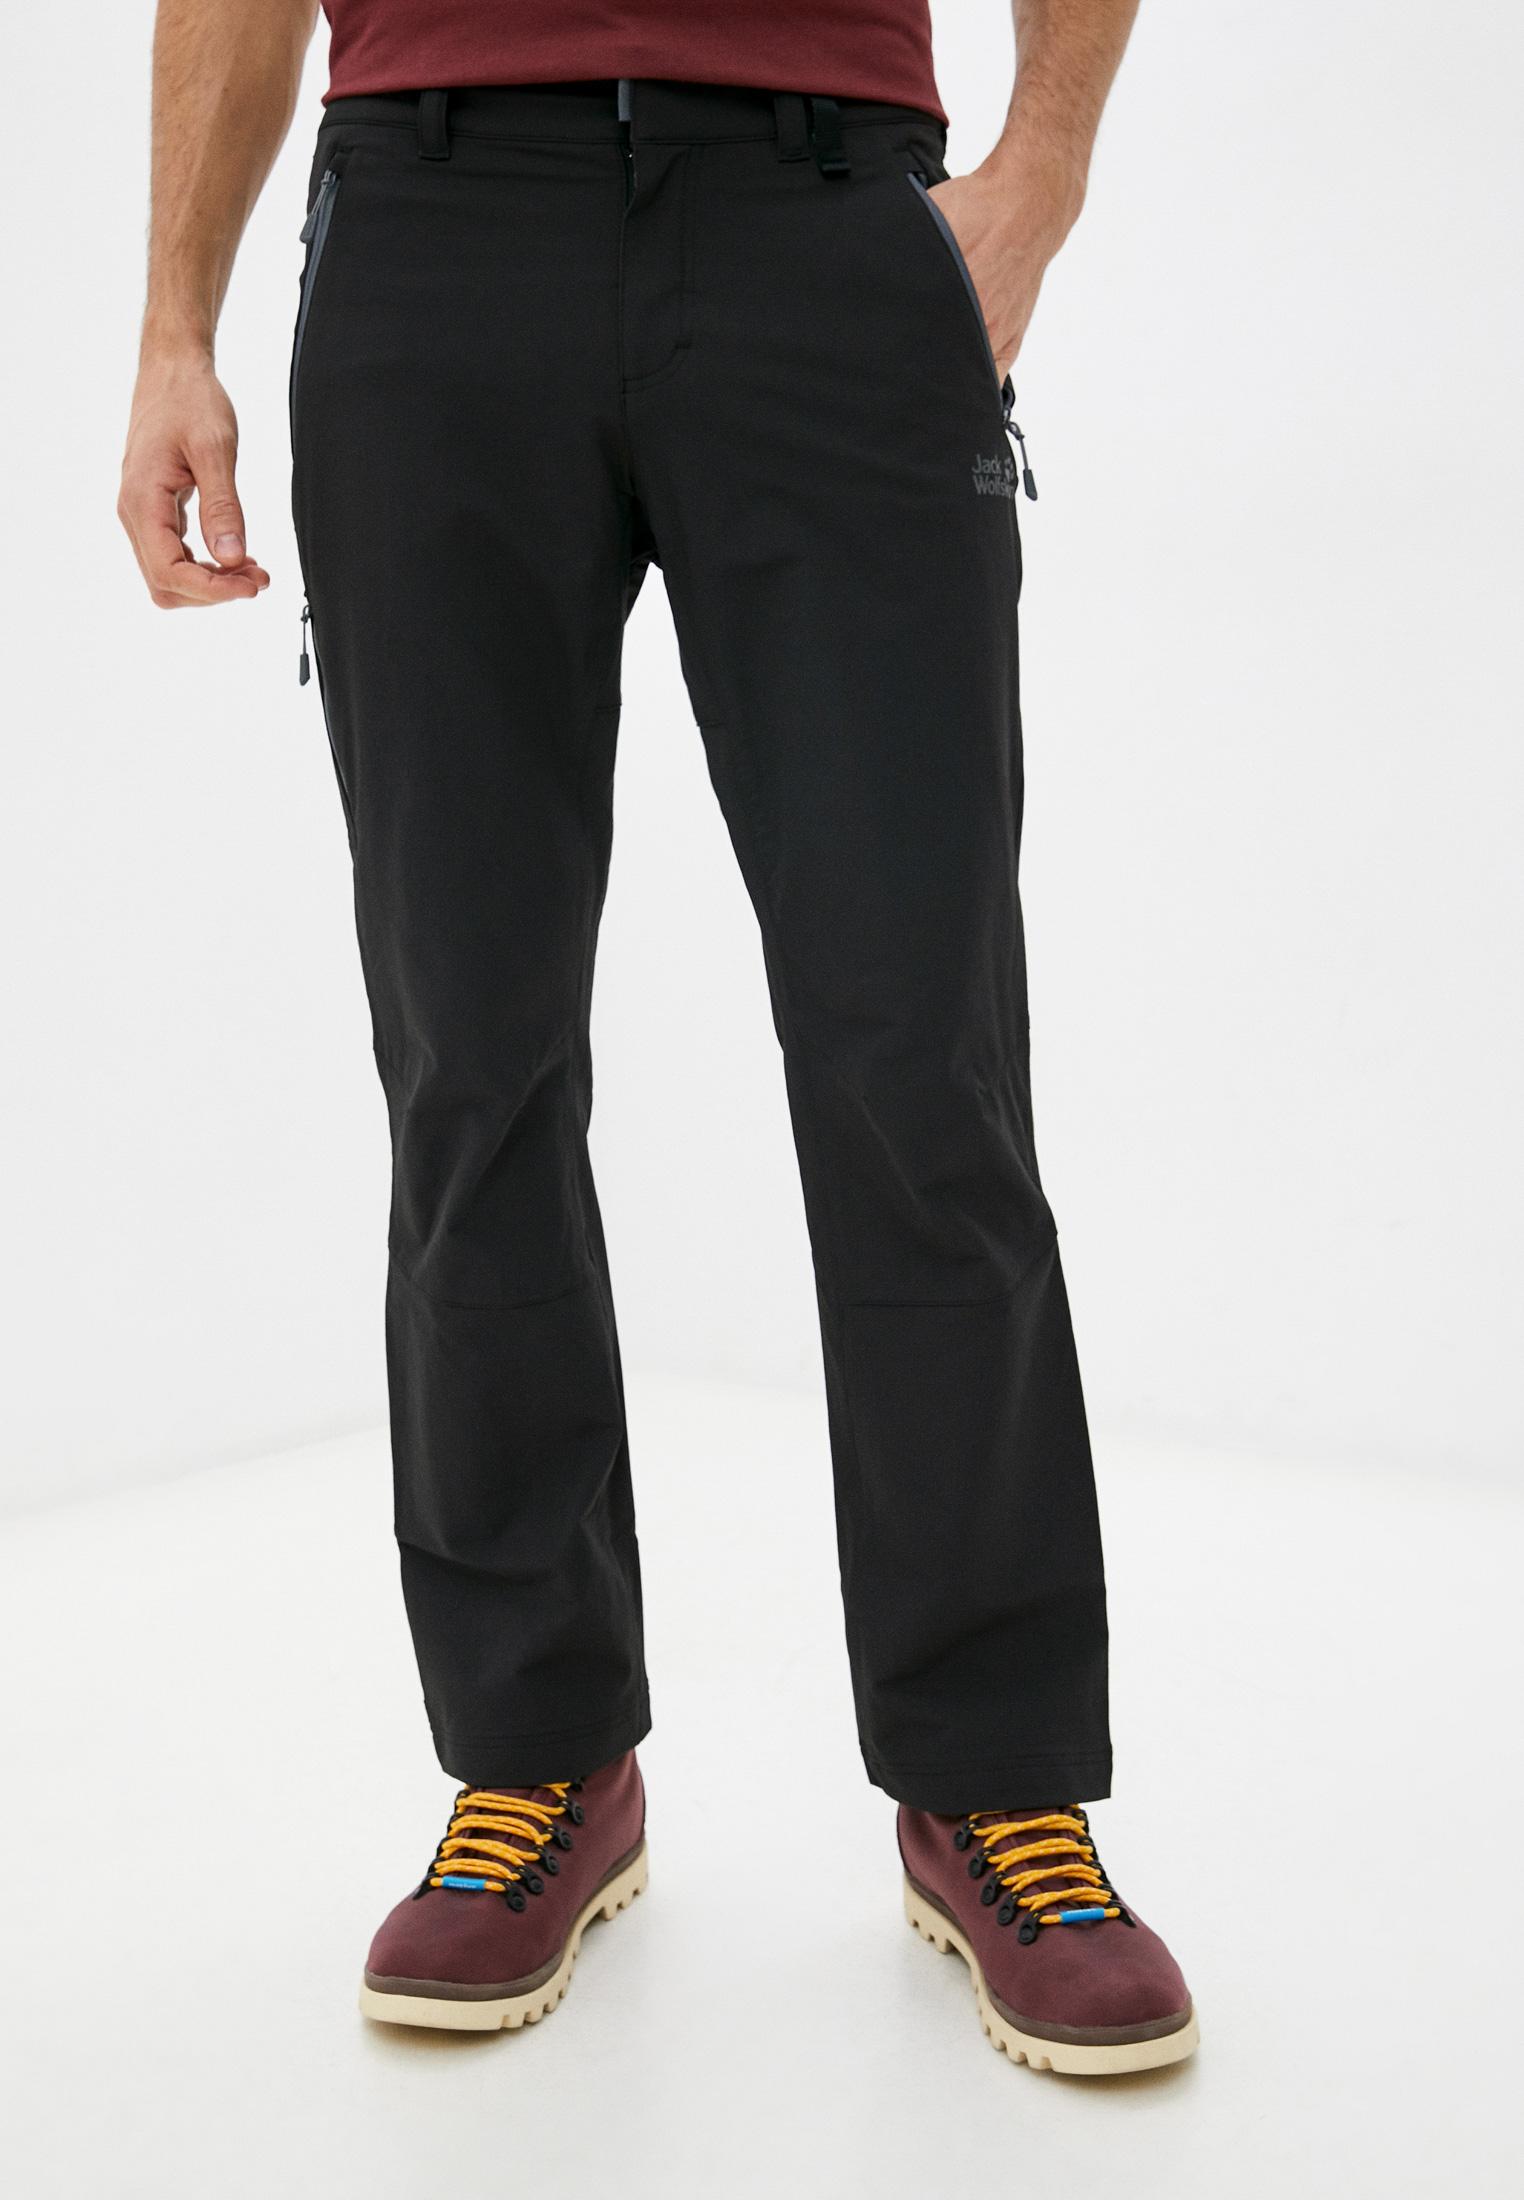 Мужские спортивные брюки Jack Wolfskin Брюки утепленные Jack Wolfskin